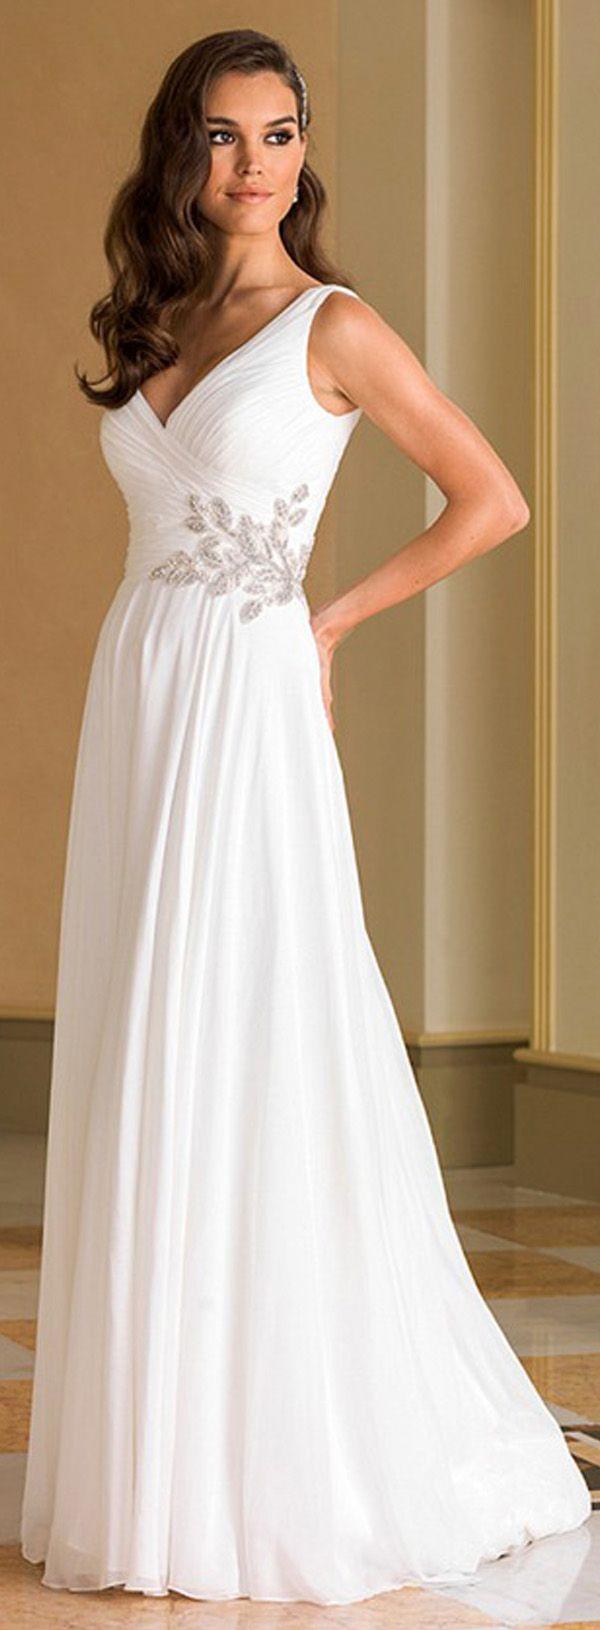 Flowing Chiffon & Stretch Satin V-Neck A-Line Wedding Dresses With Pleats